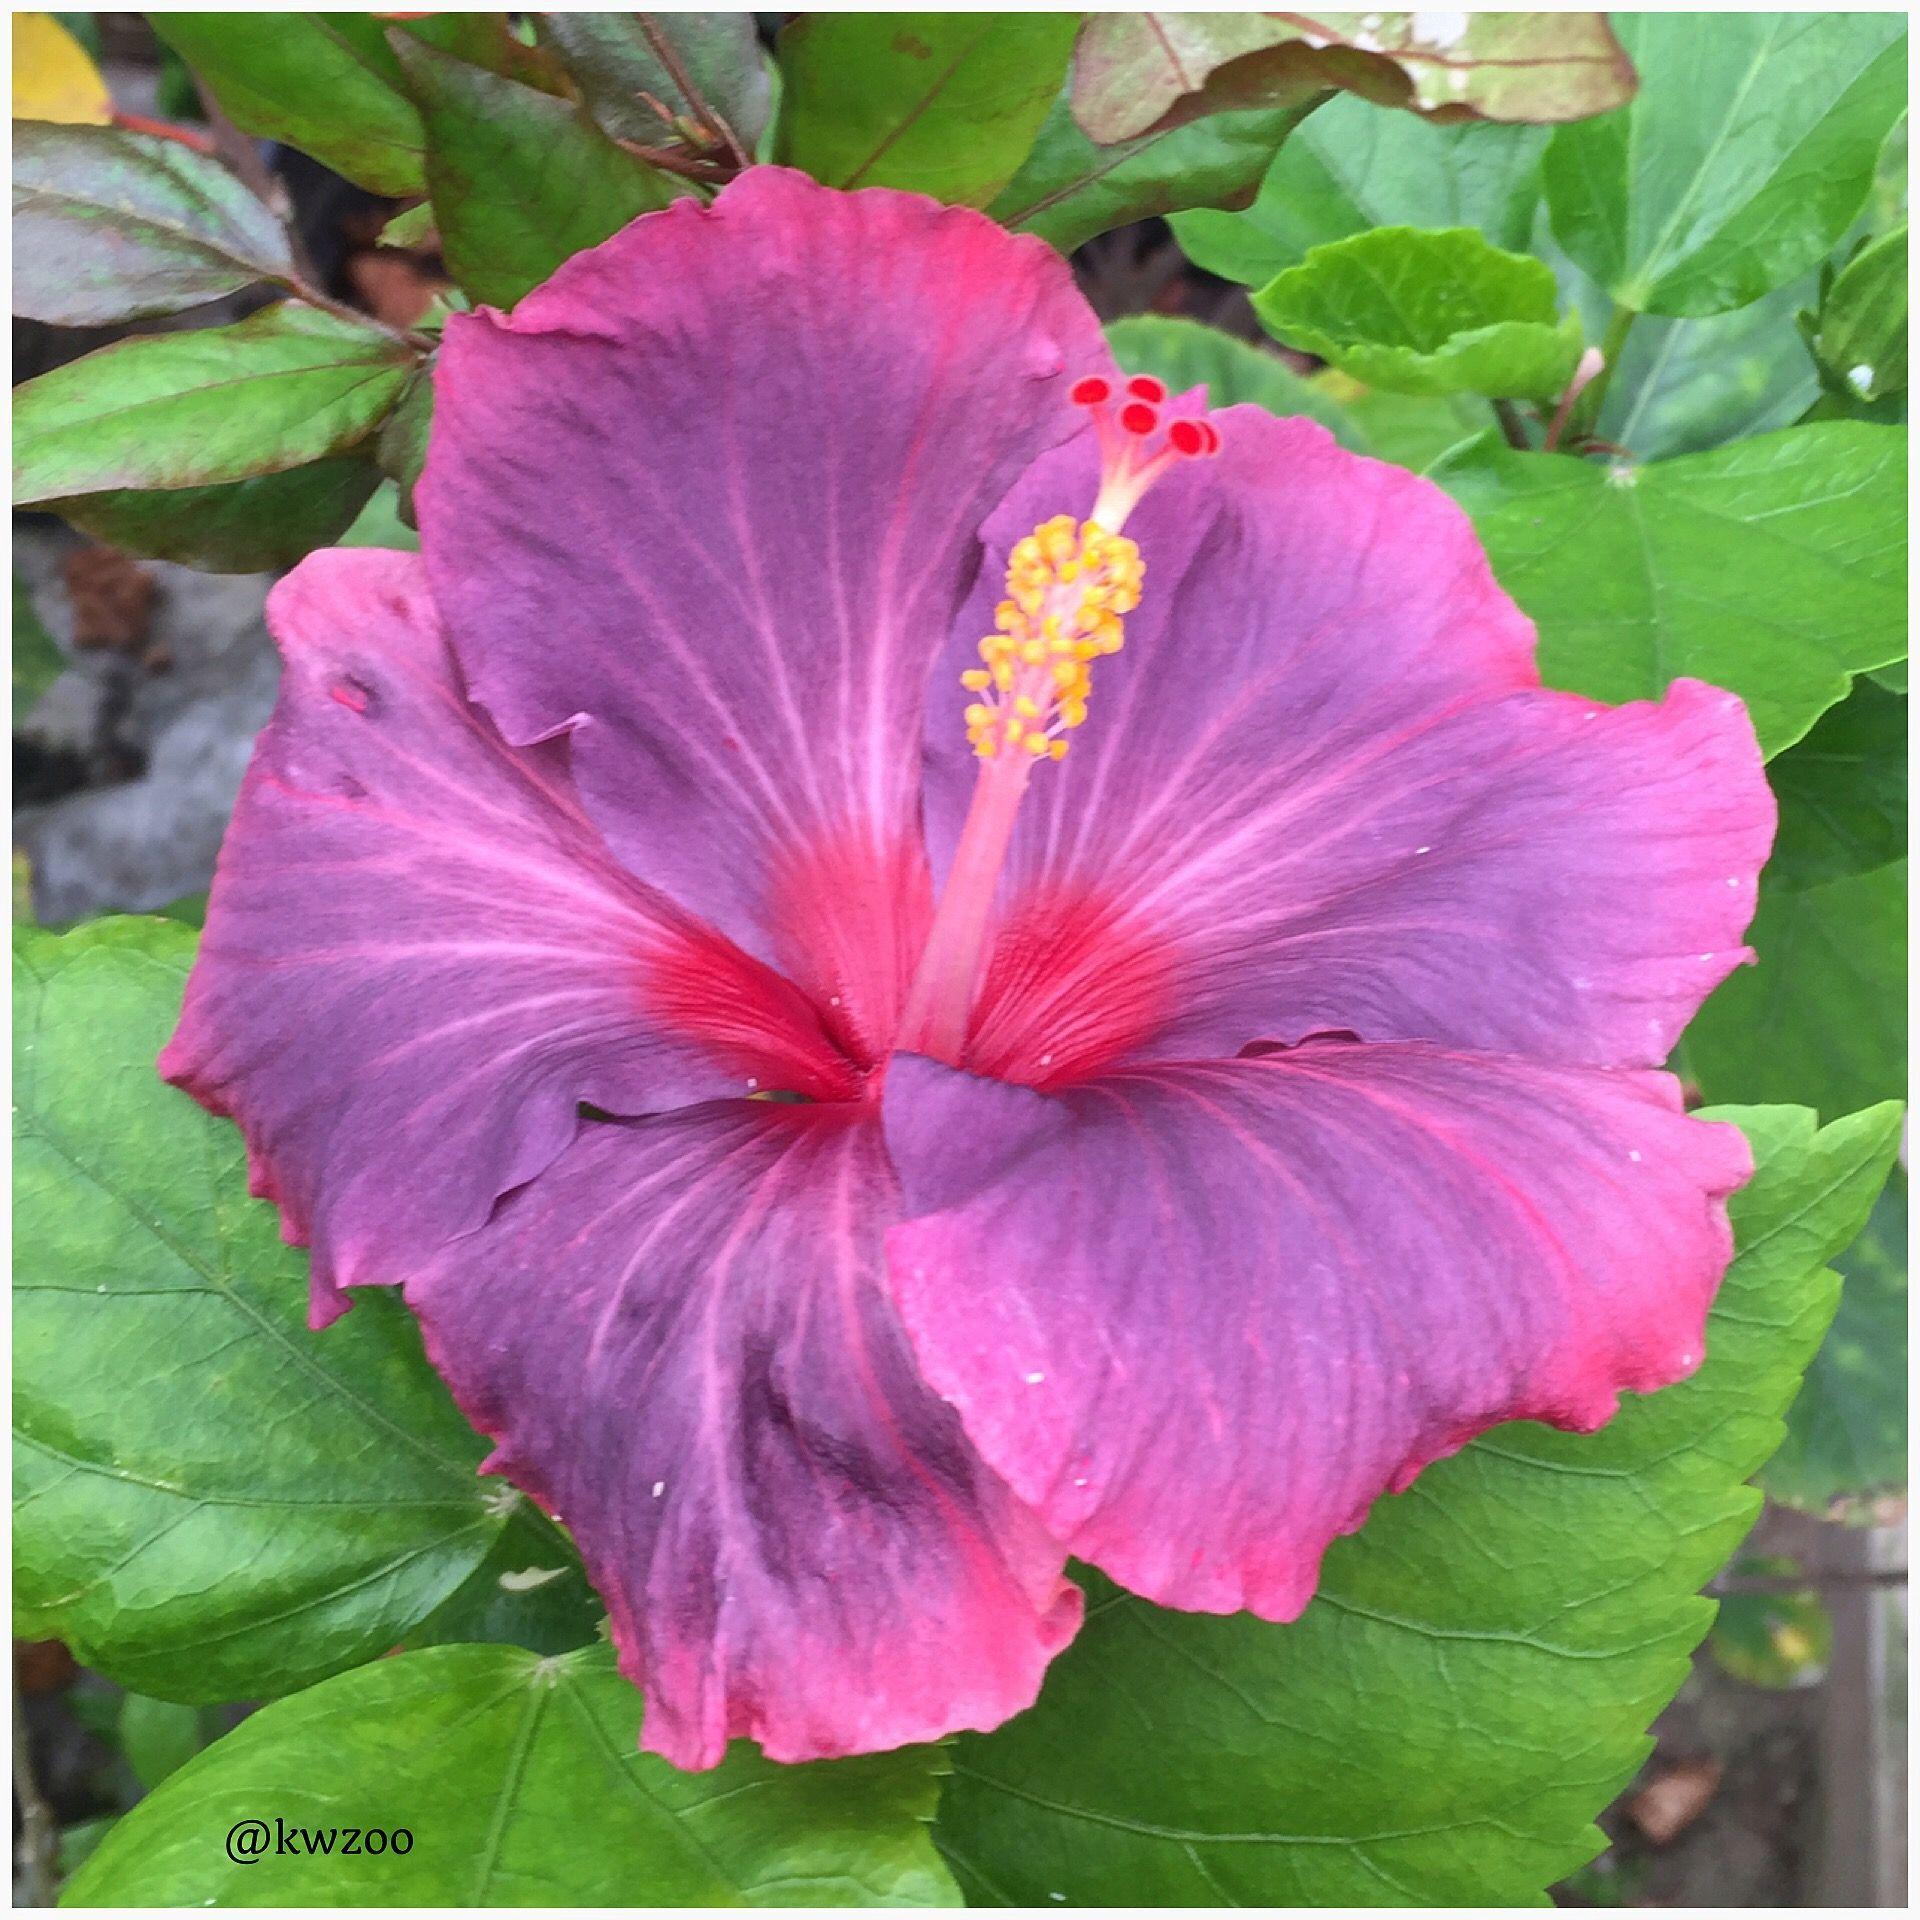 Hibiscus kuwaitzoo hibiscus flowers pinterest hibiscus hibiscus kuwaitzoo izmirmasajfo